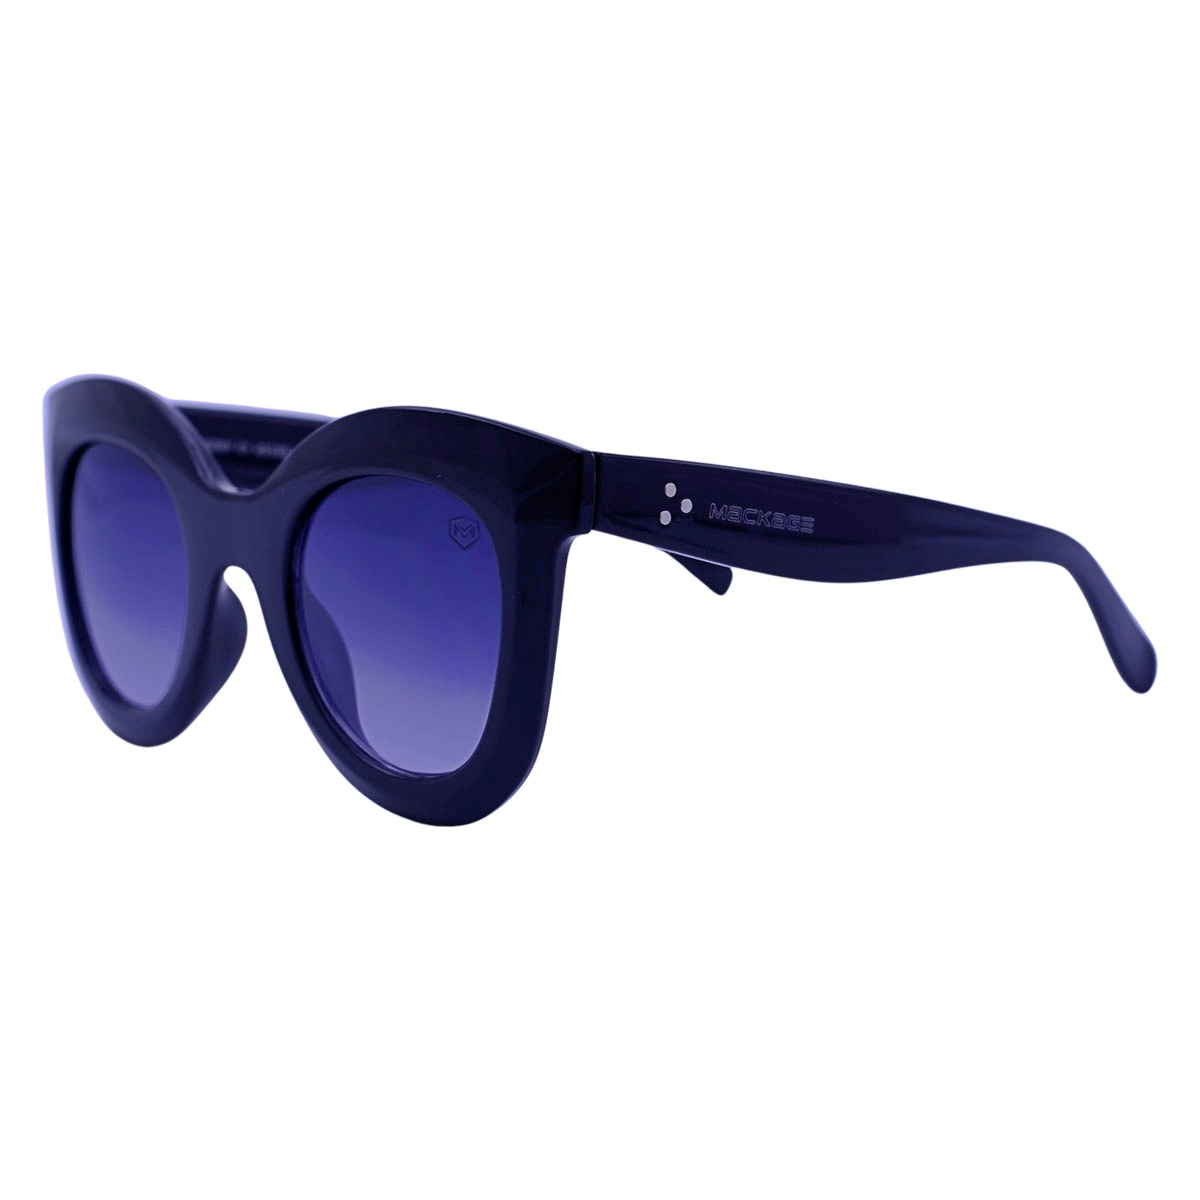 Óculos De Sol Mackage Feminino Acetato Oversize Redondo Retro